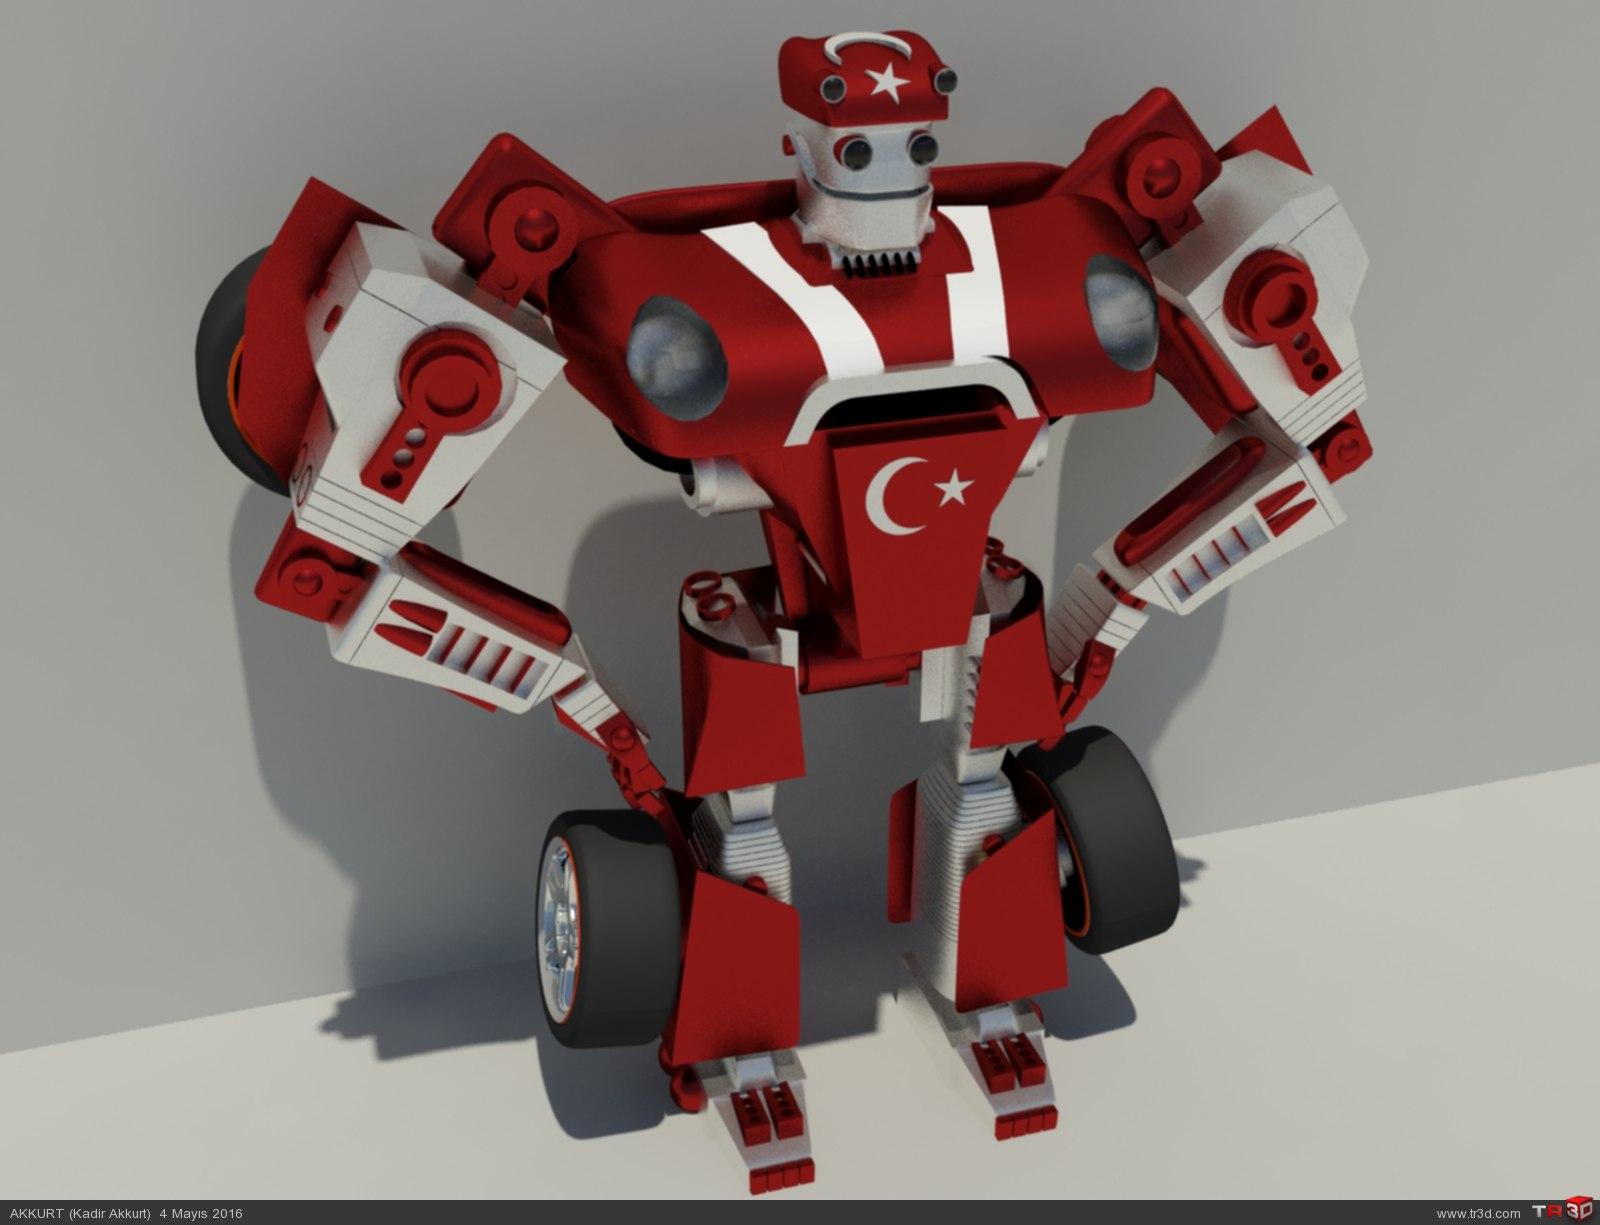 Türk Robot